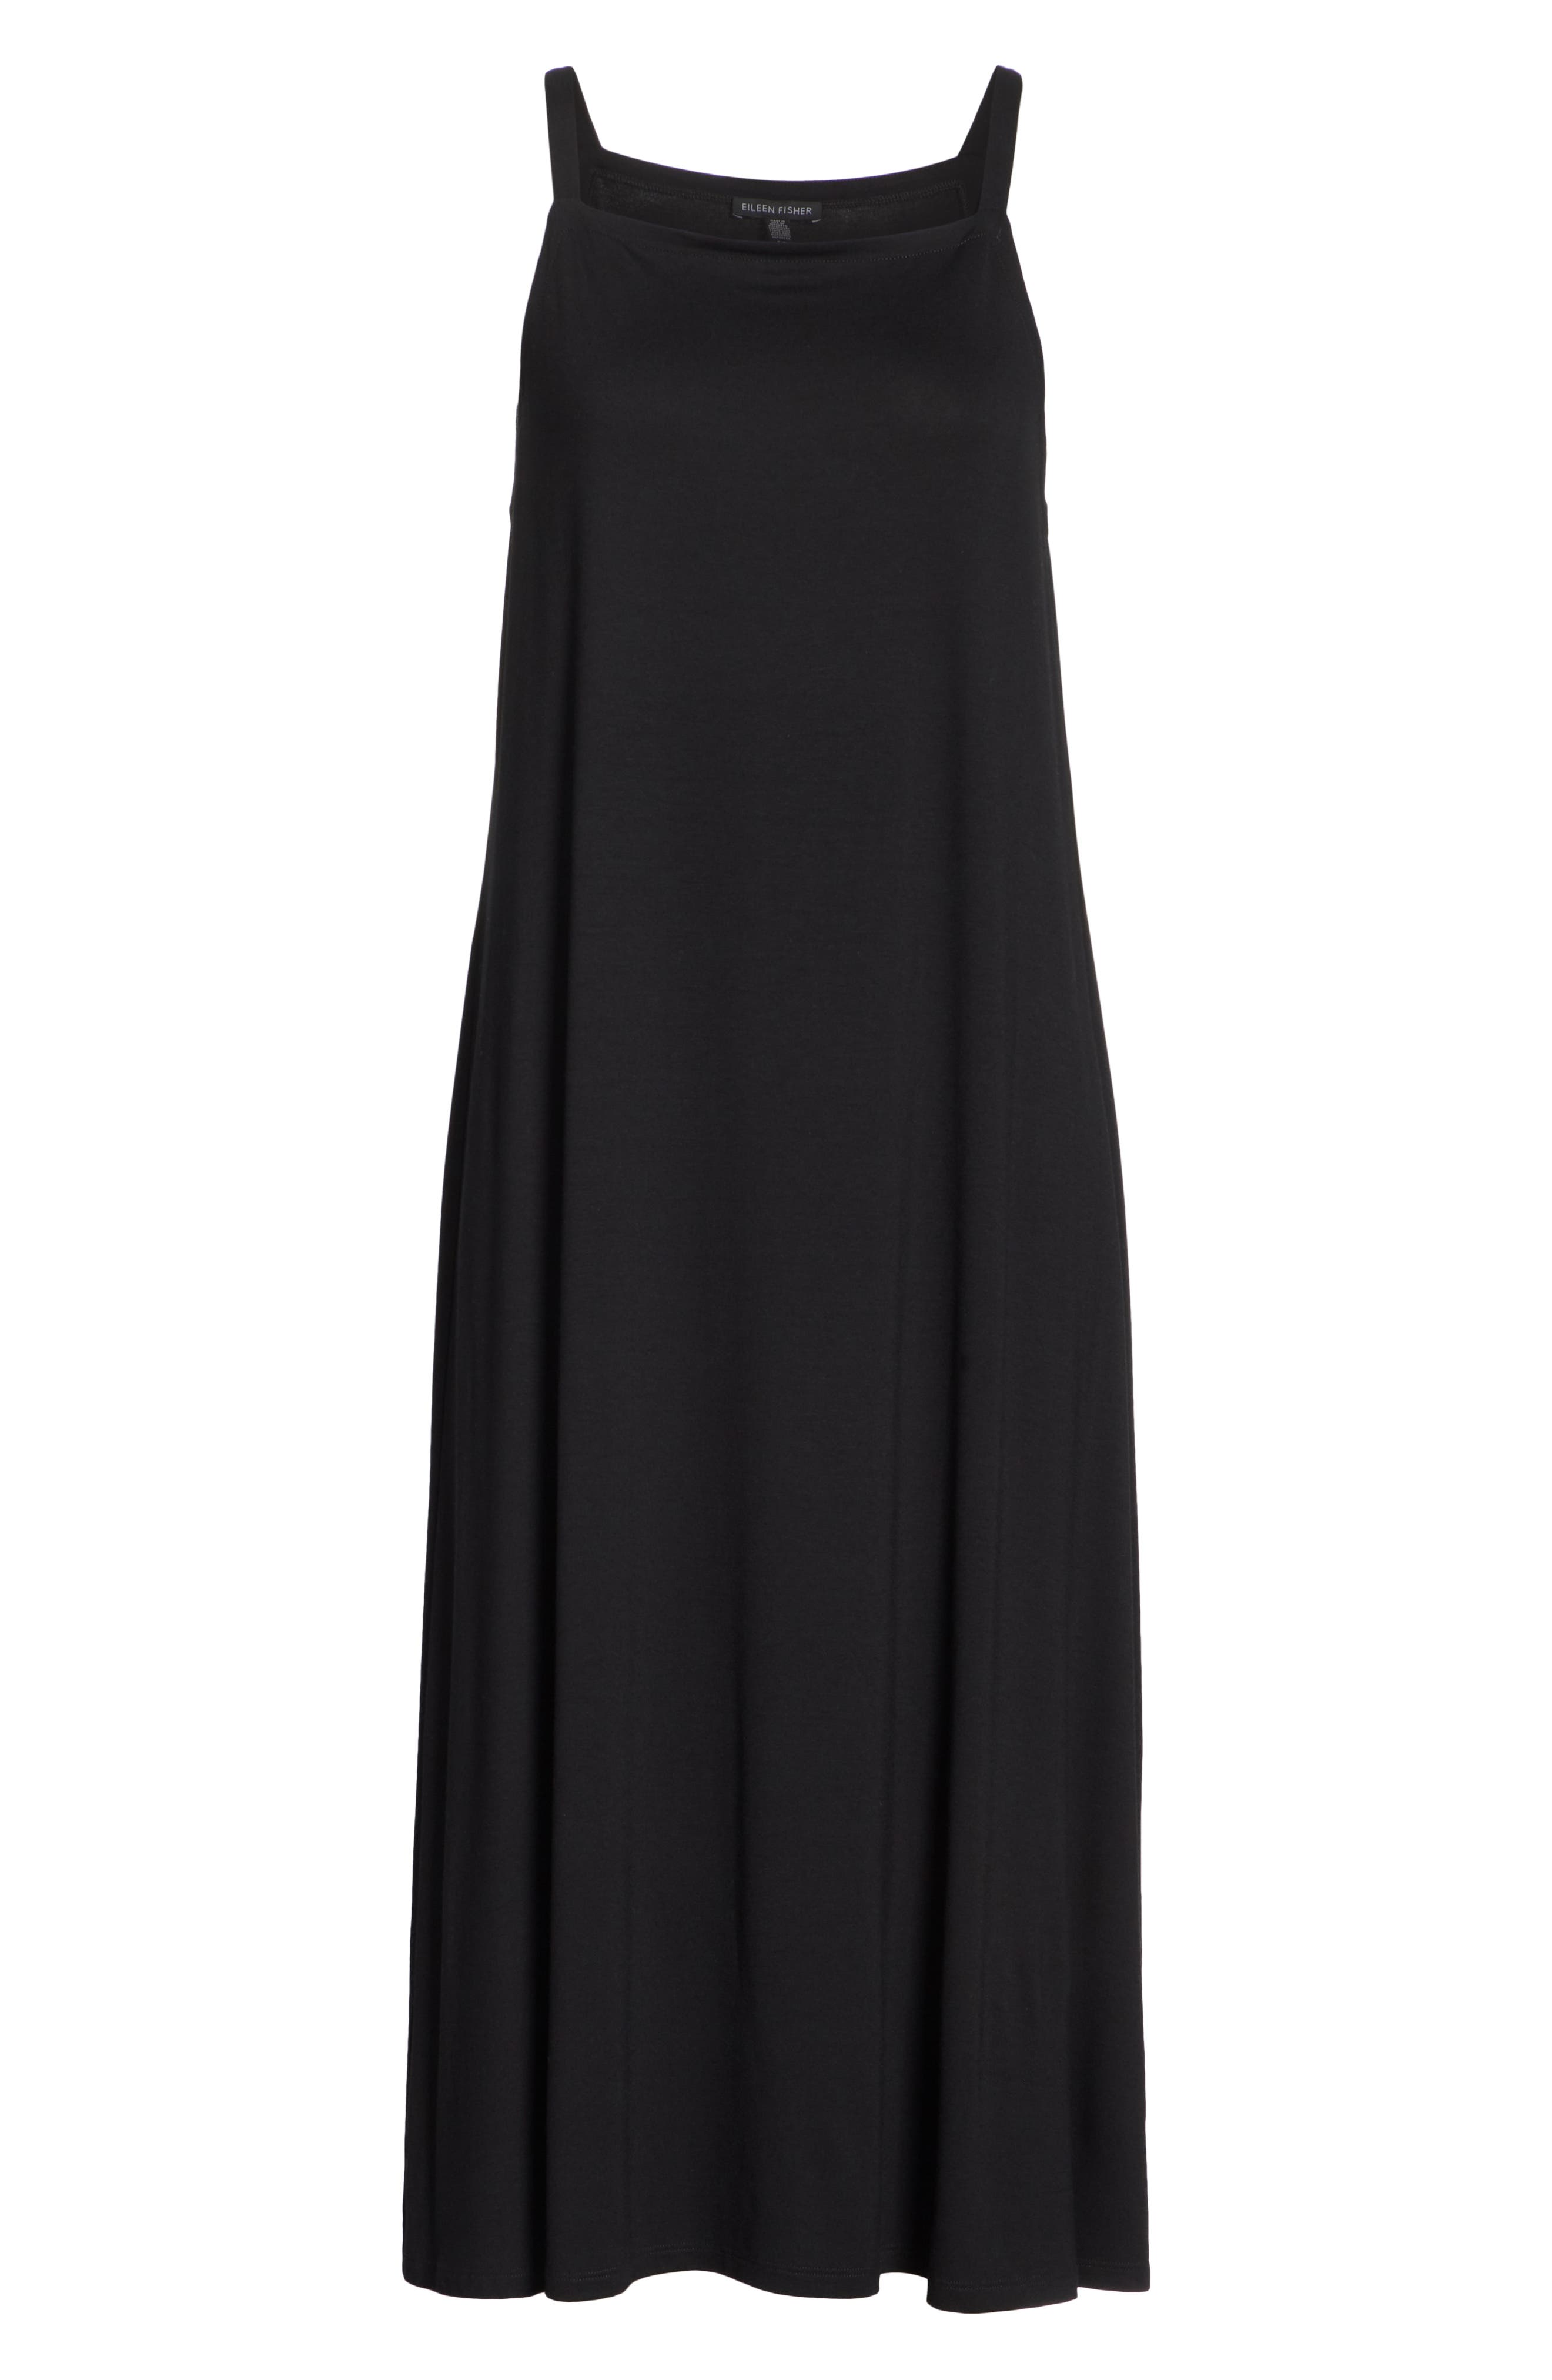 Cami Dress,                             Alternate thumbnail 6, color,                             Black